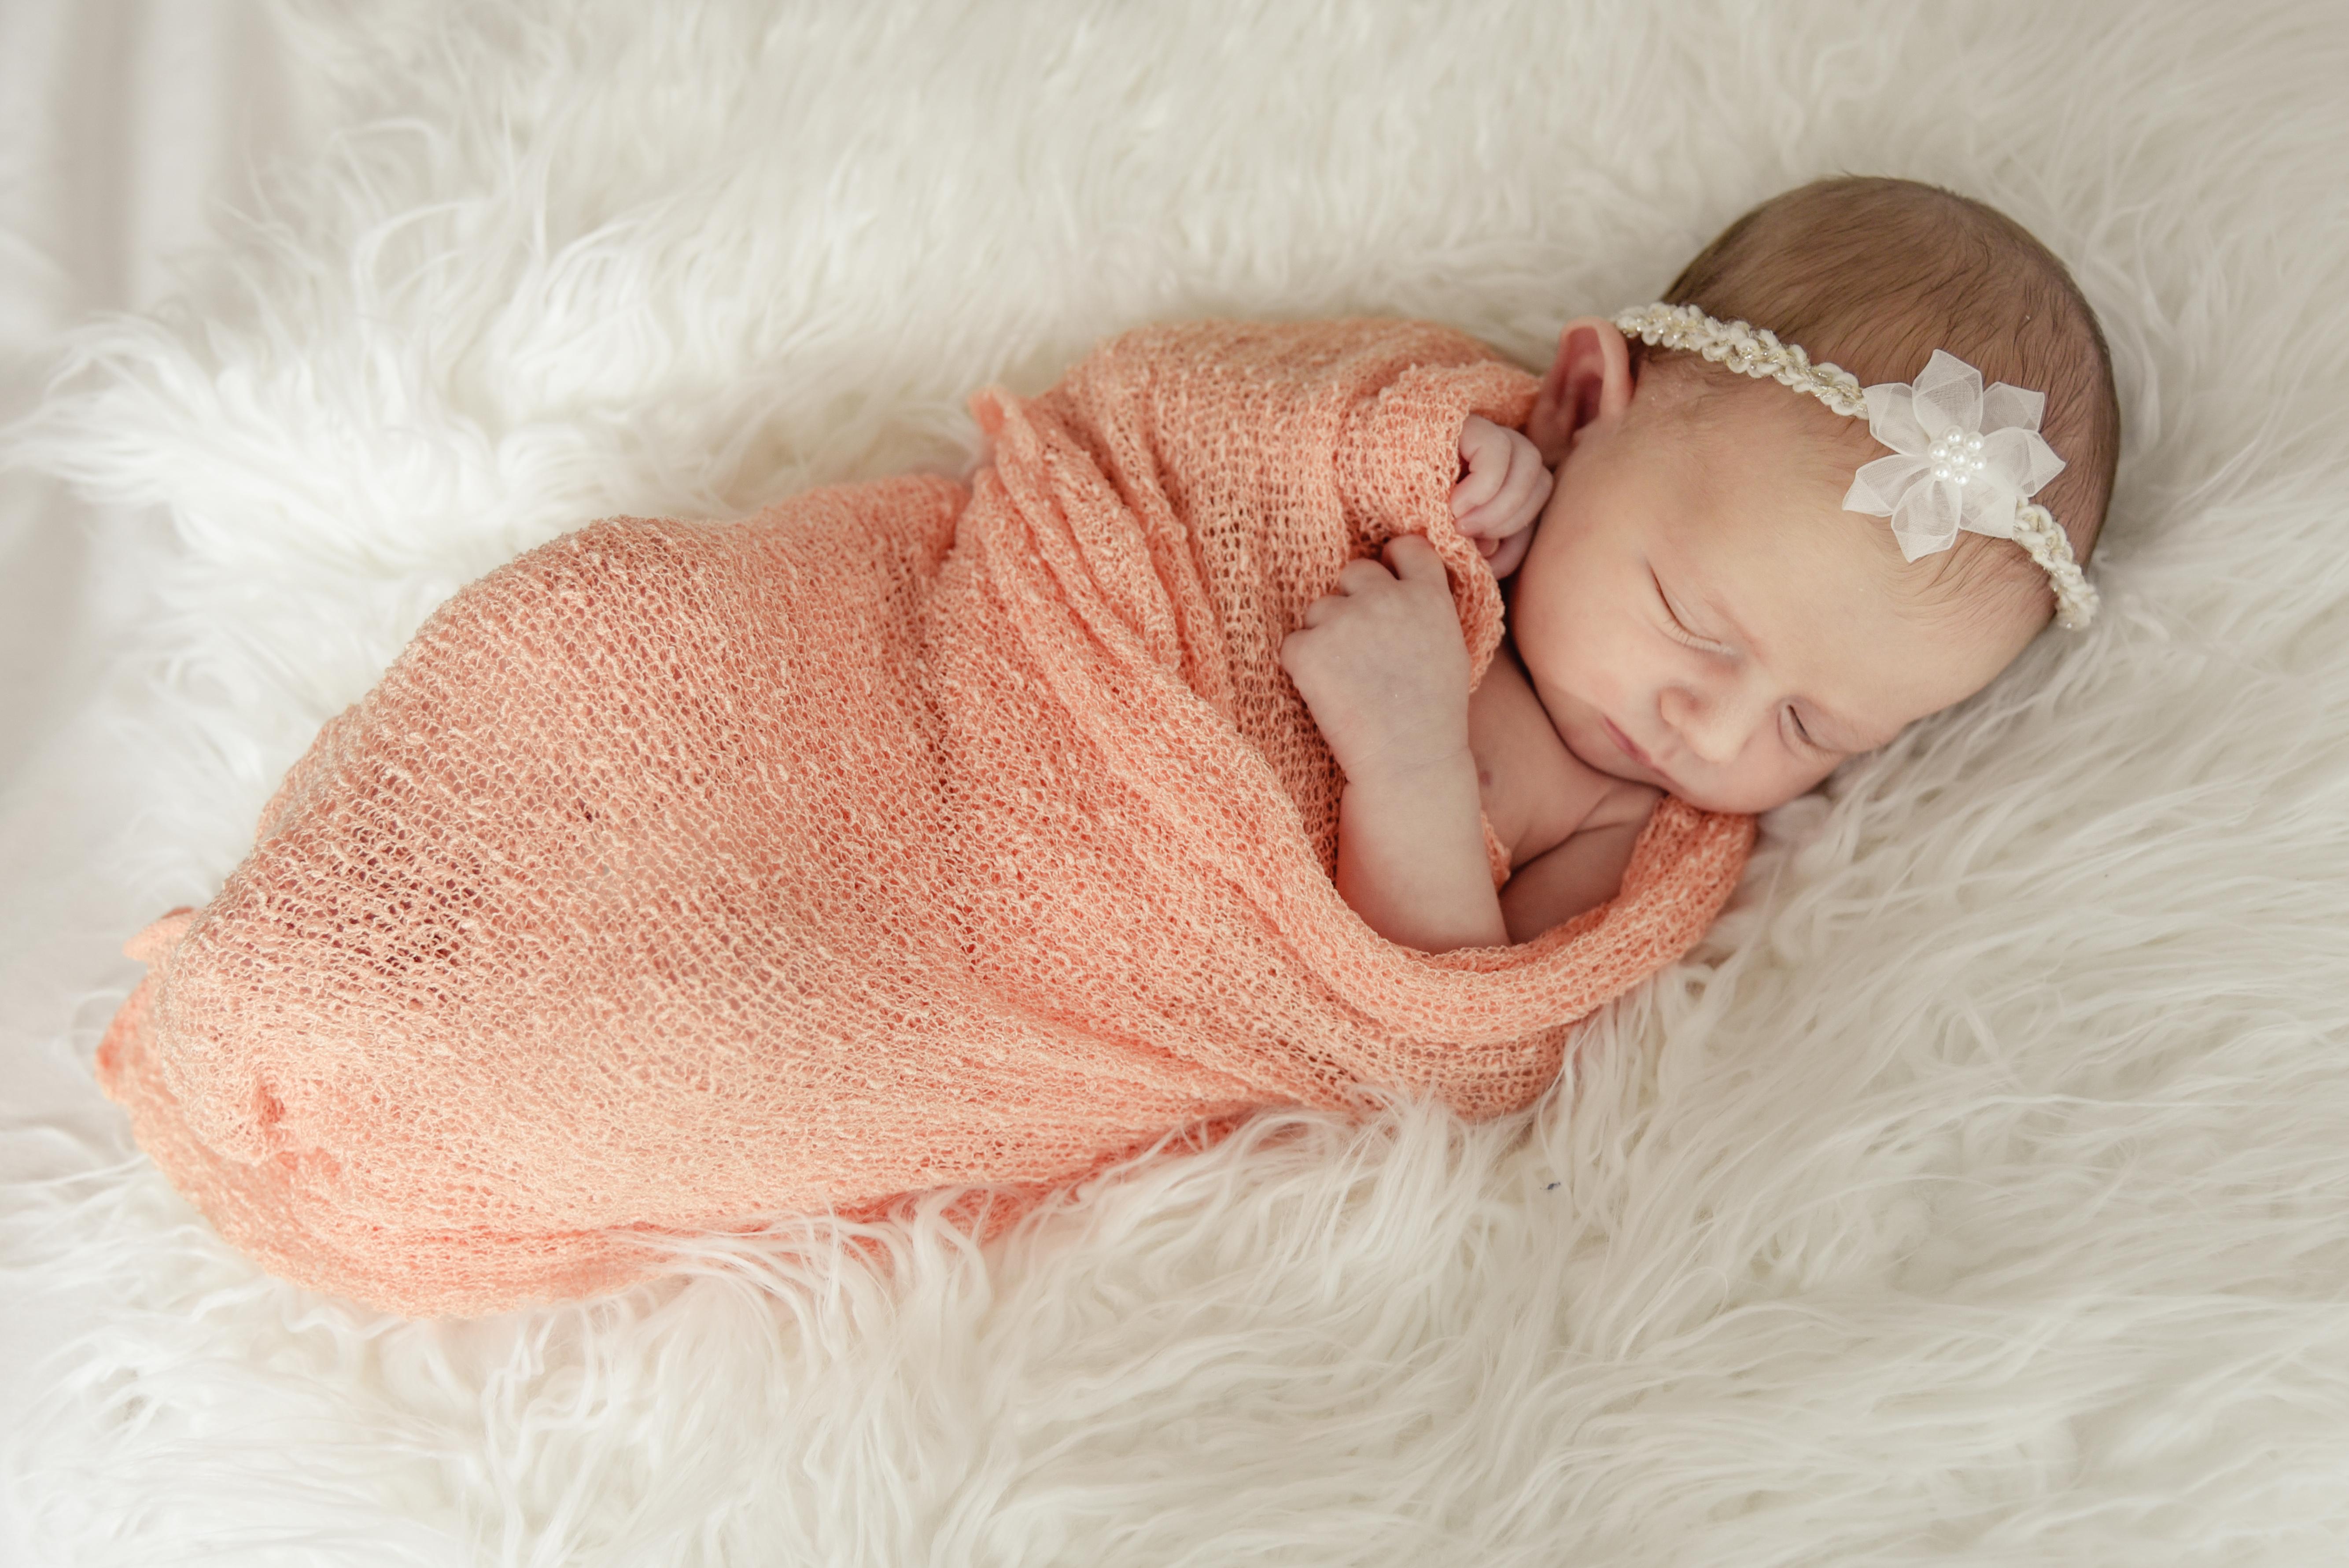 Shruttigarg_newborn photography-21